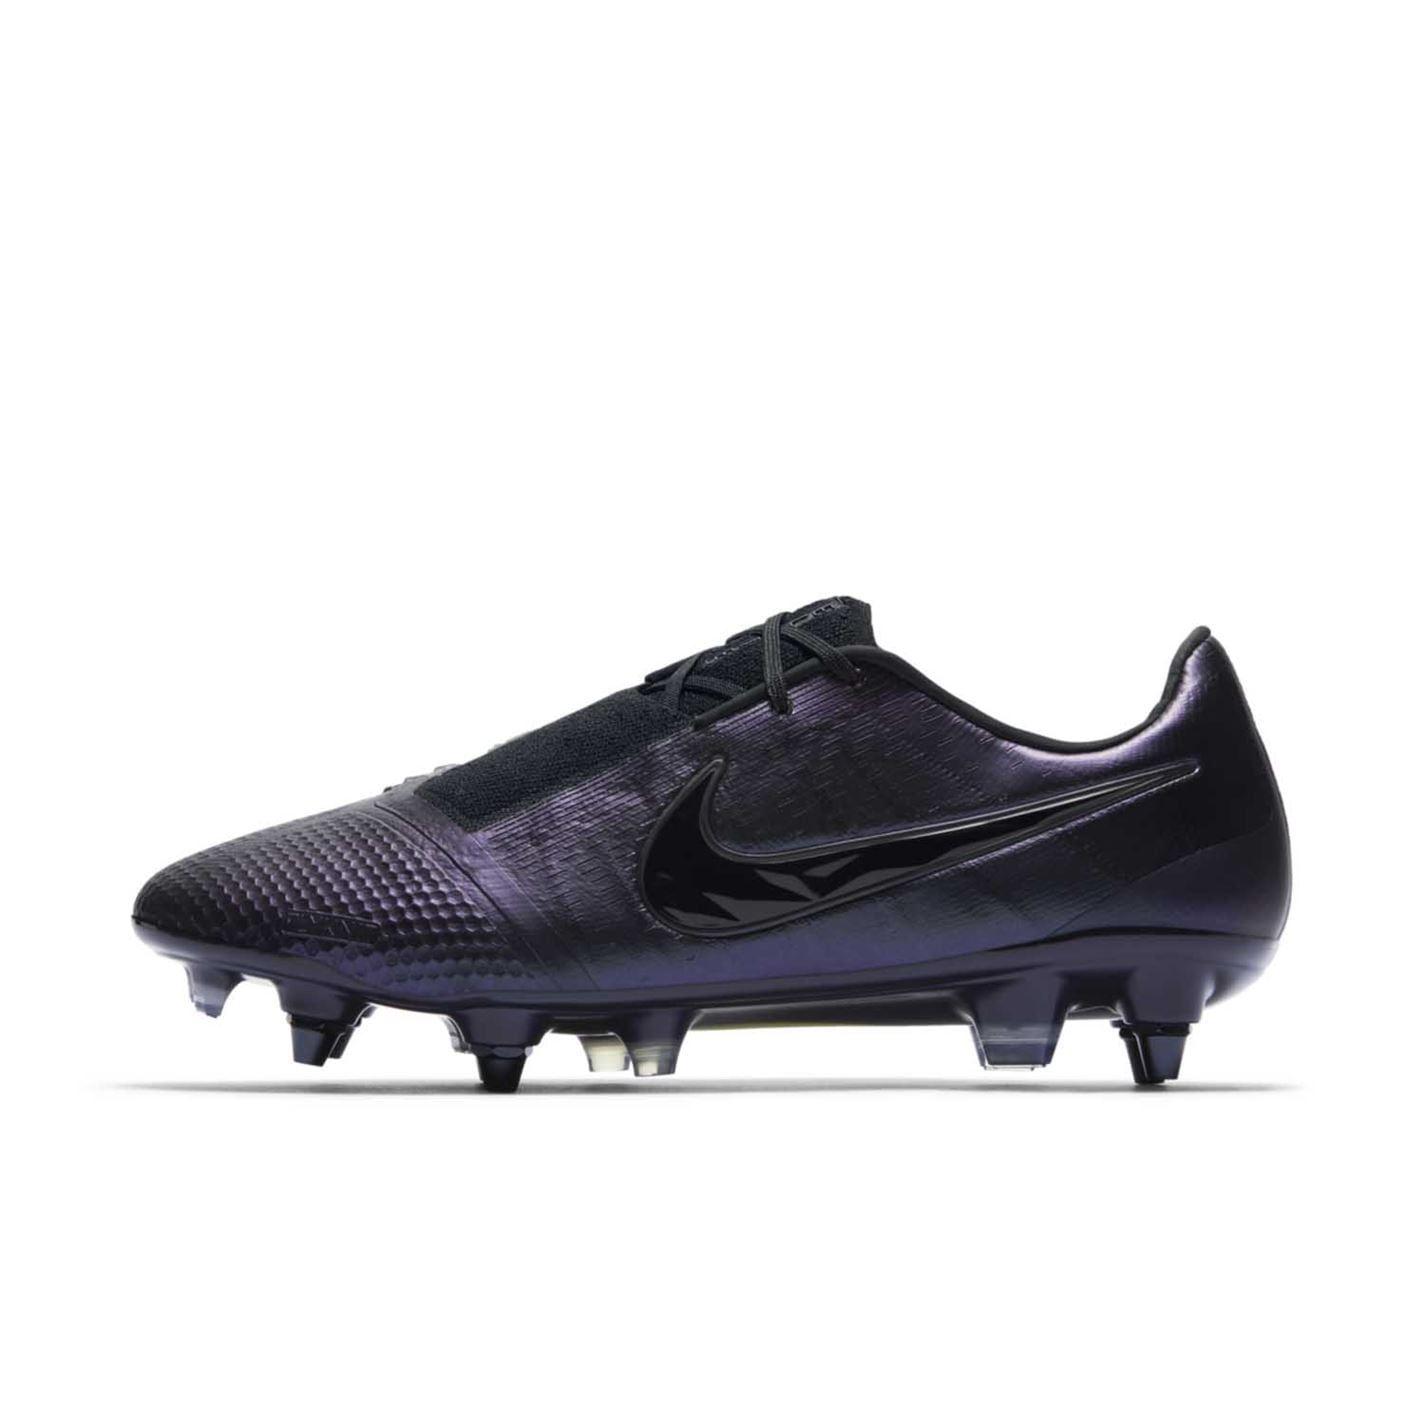 Nike-Phantom-Venom-Elite-Homme-SG-Terrain-Souple-Chaussures-De-Football-Chaussures-de-foot-crampons miniature 8